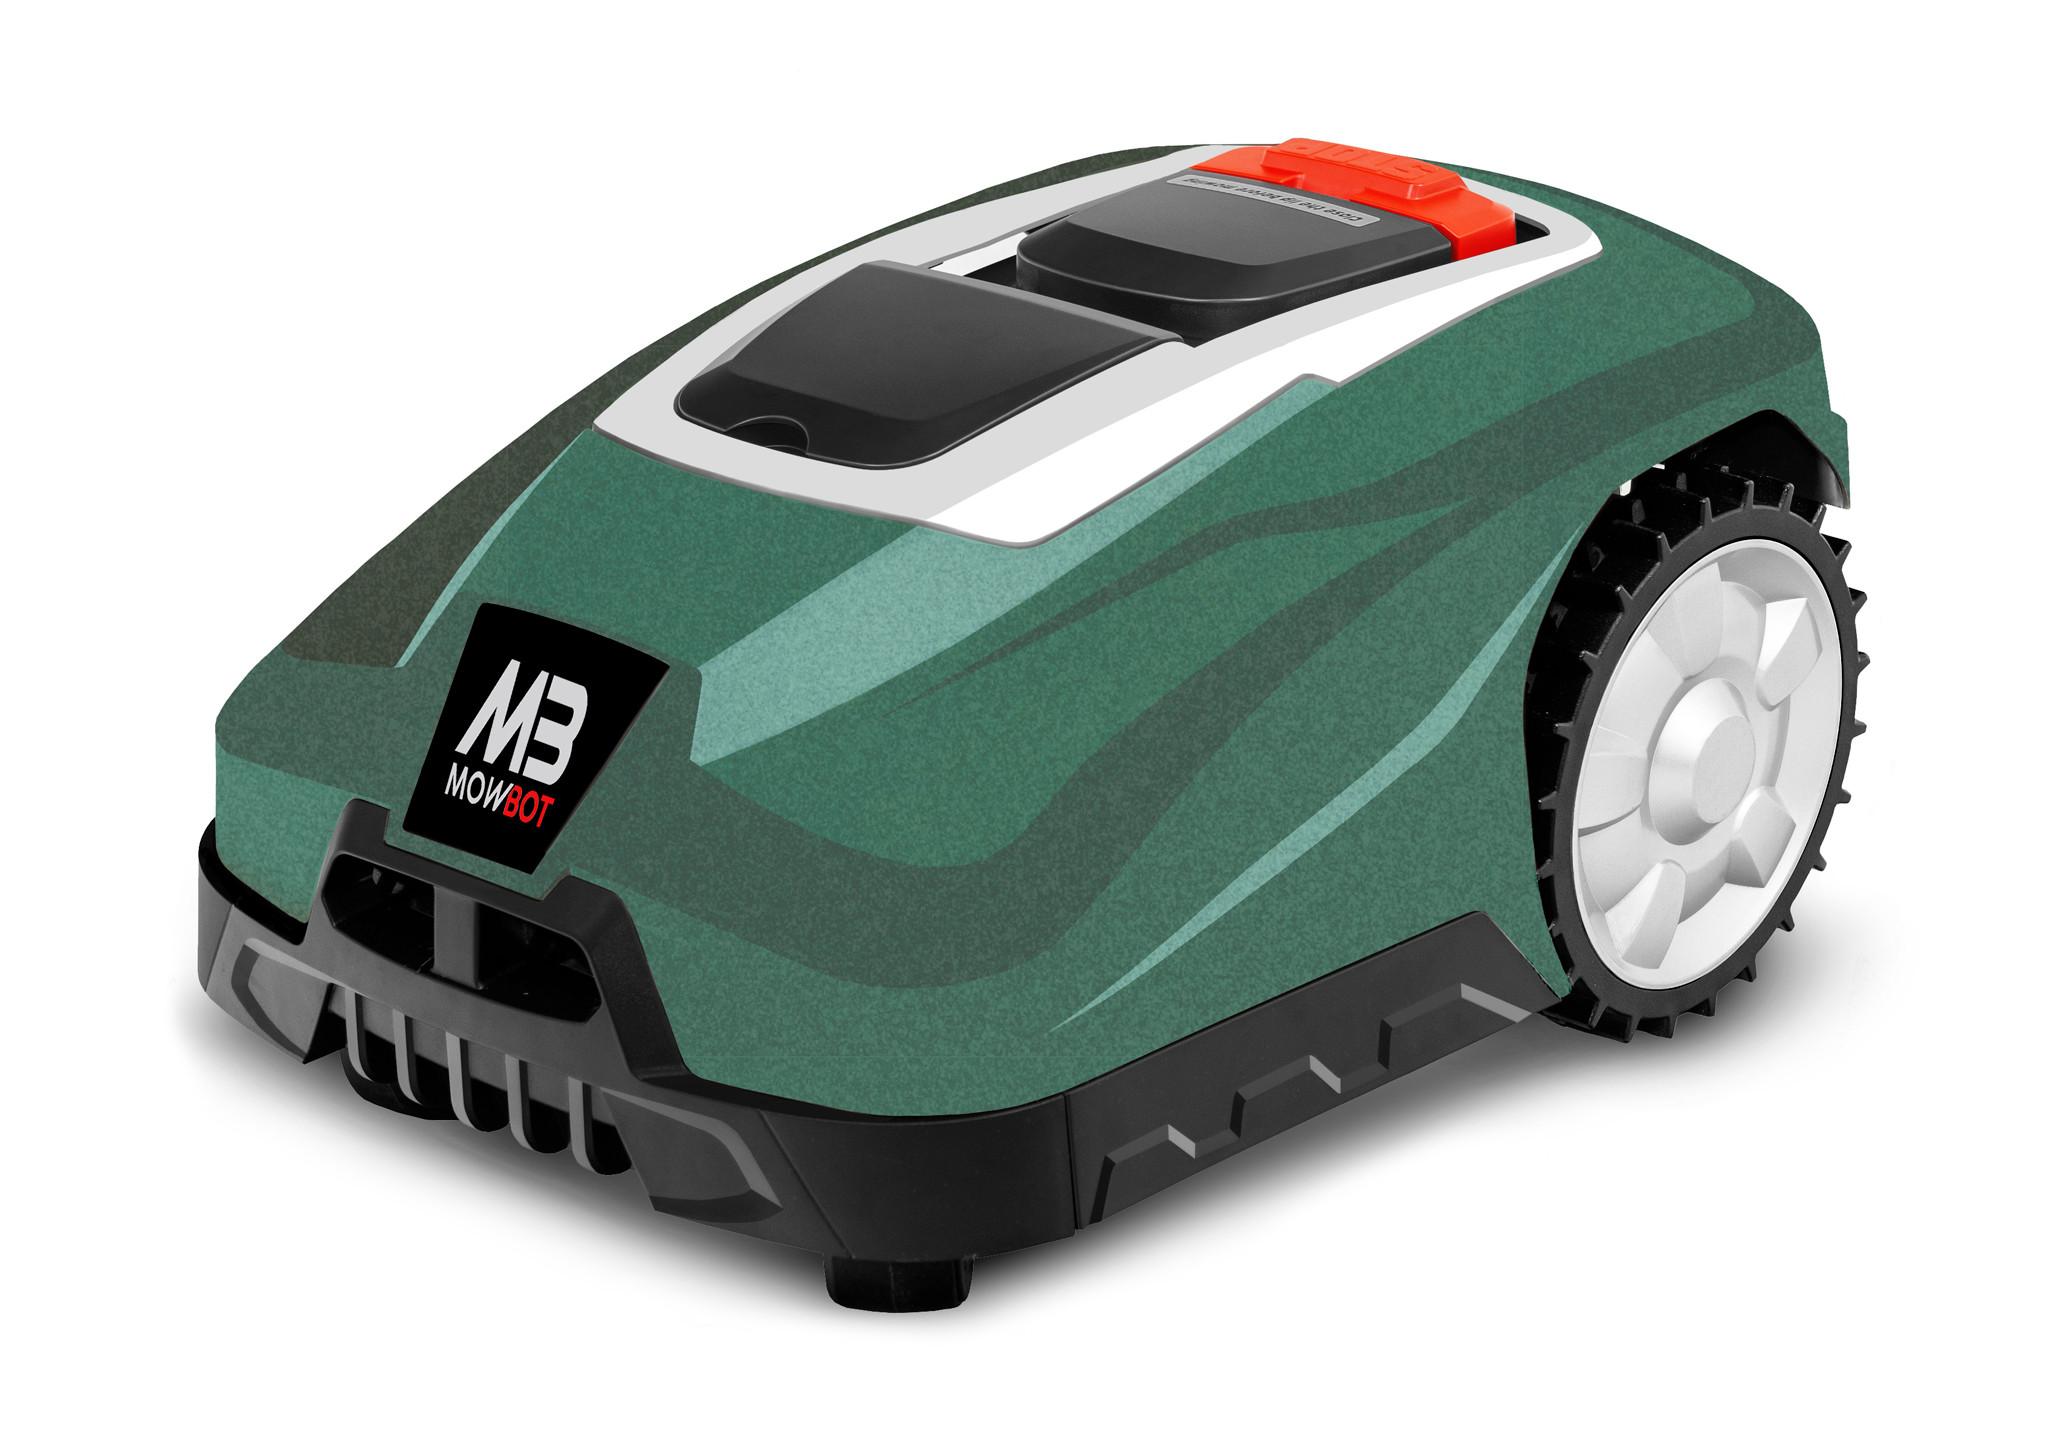 Mowbot 800MG Metallic Green 800sq/m Robotic Mower